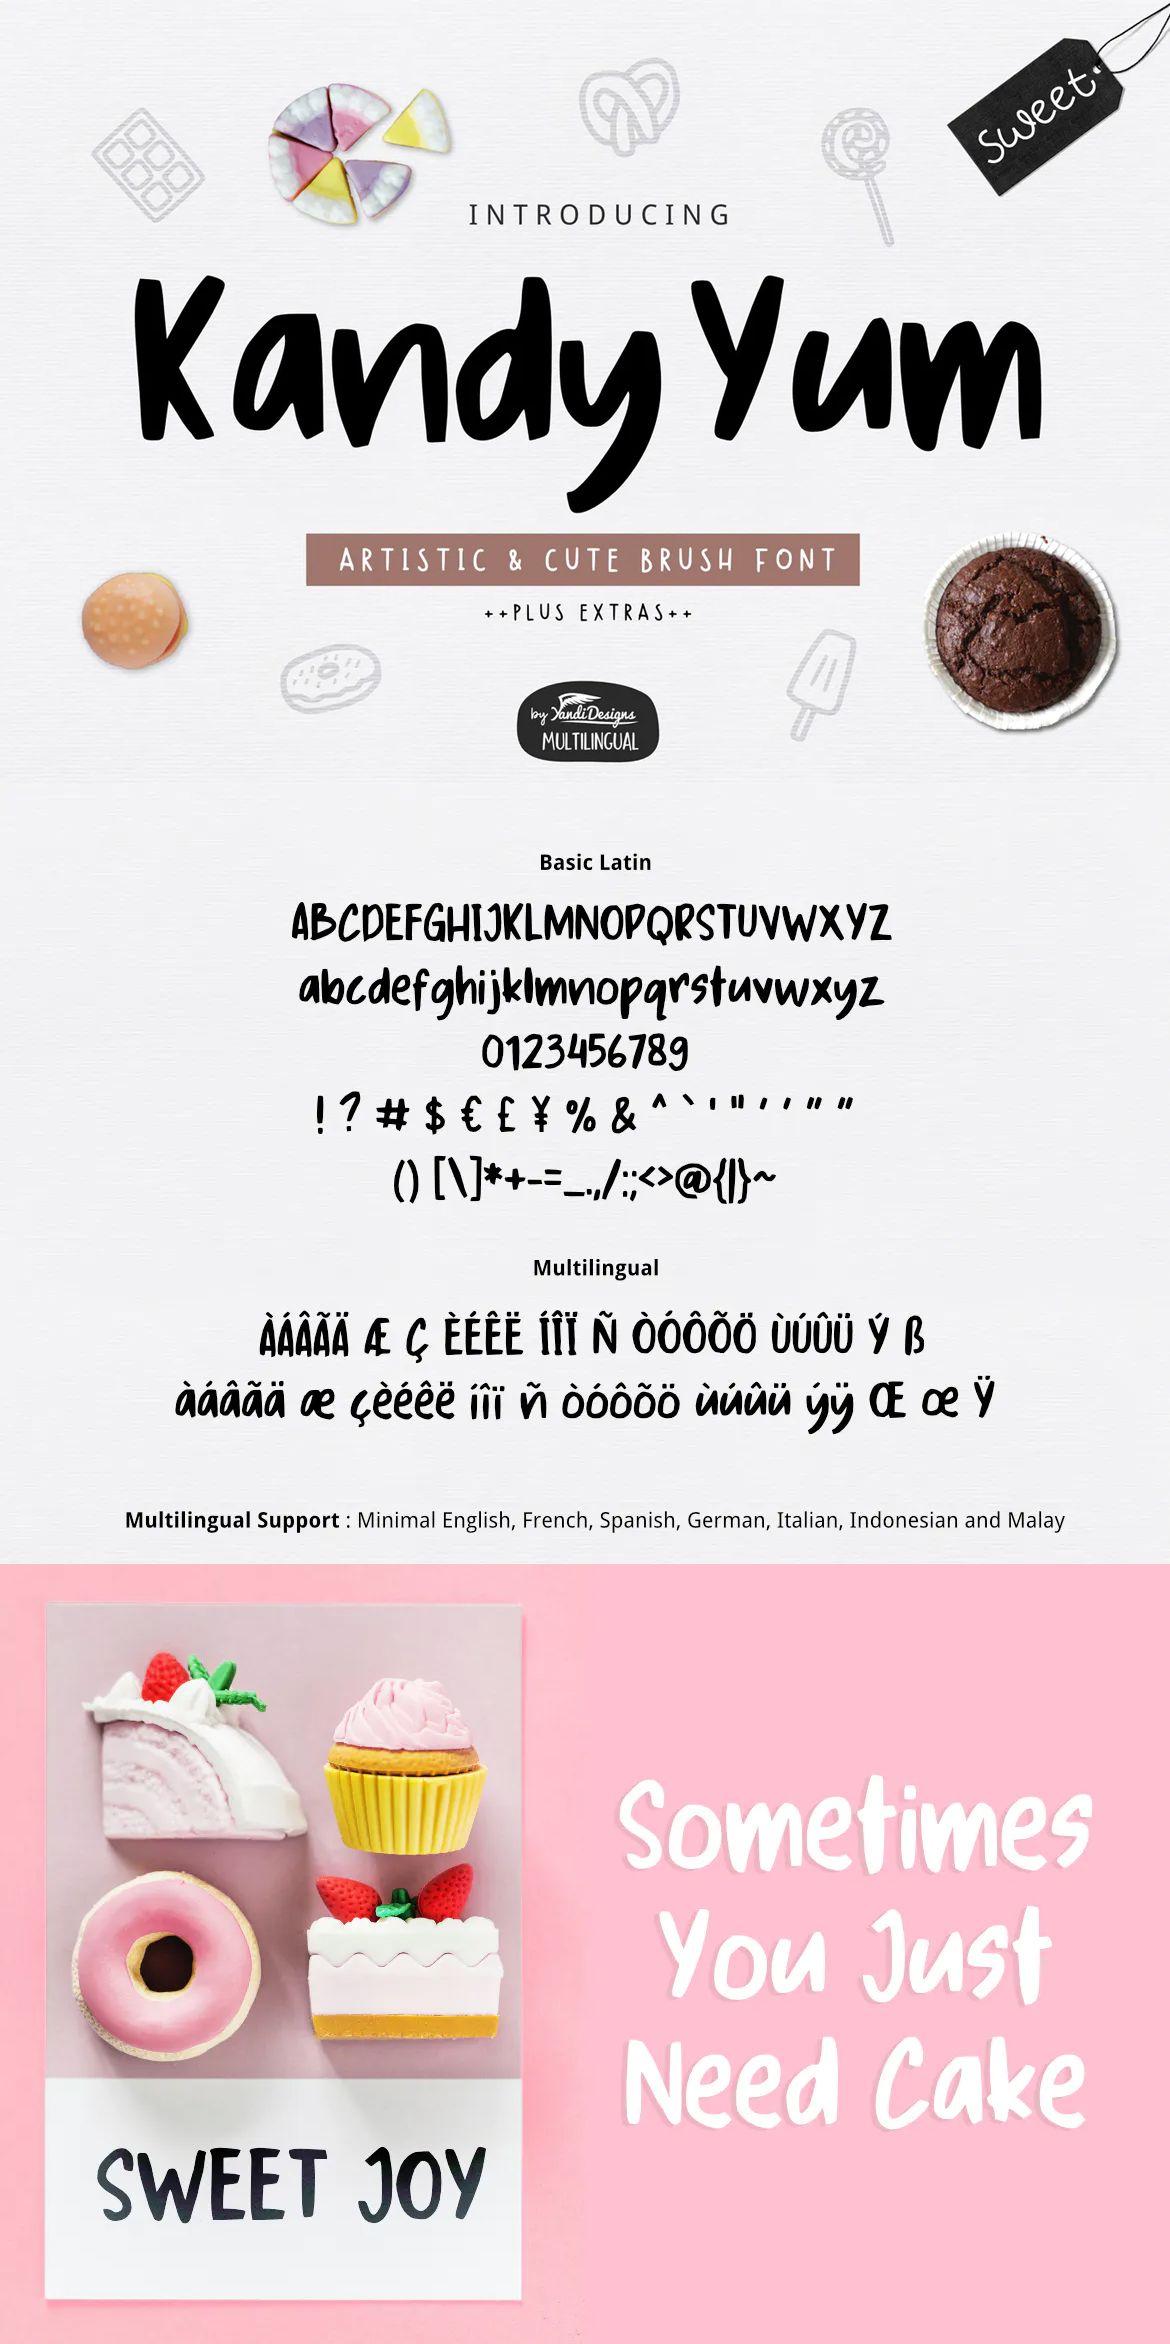 Kandy Yum Font by yandidesigns on Retro logos, Fonts